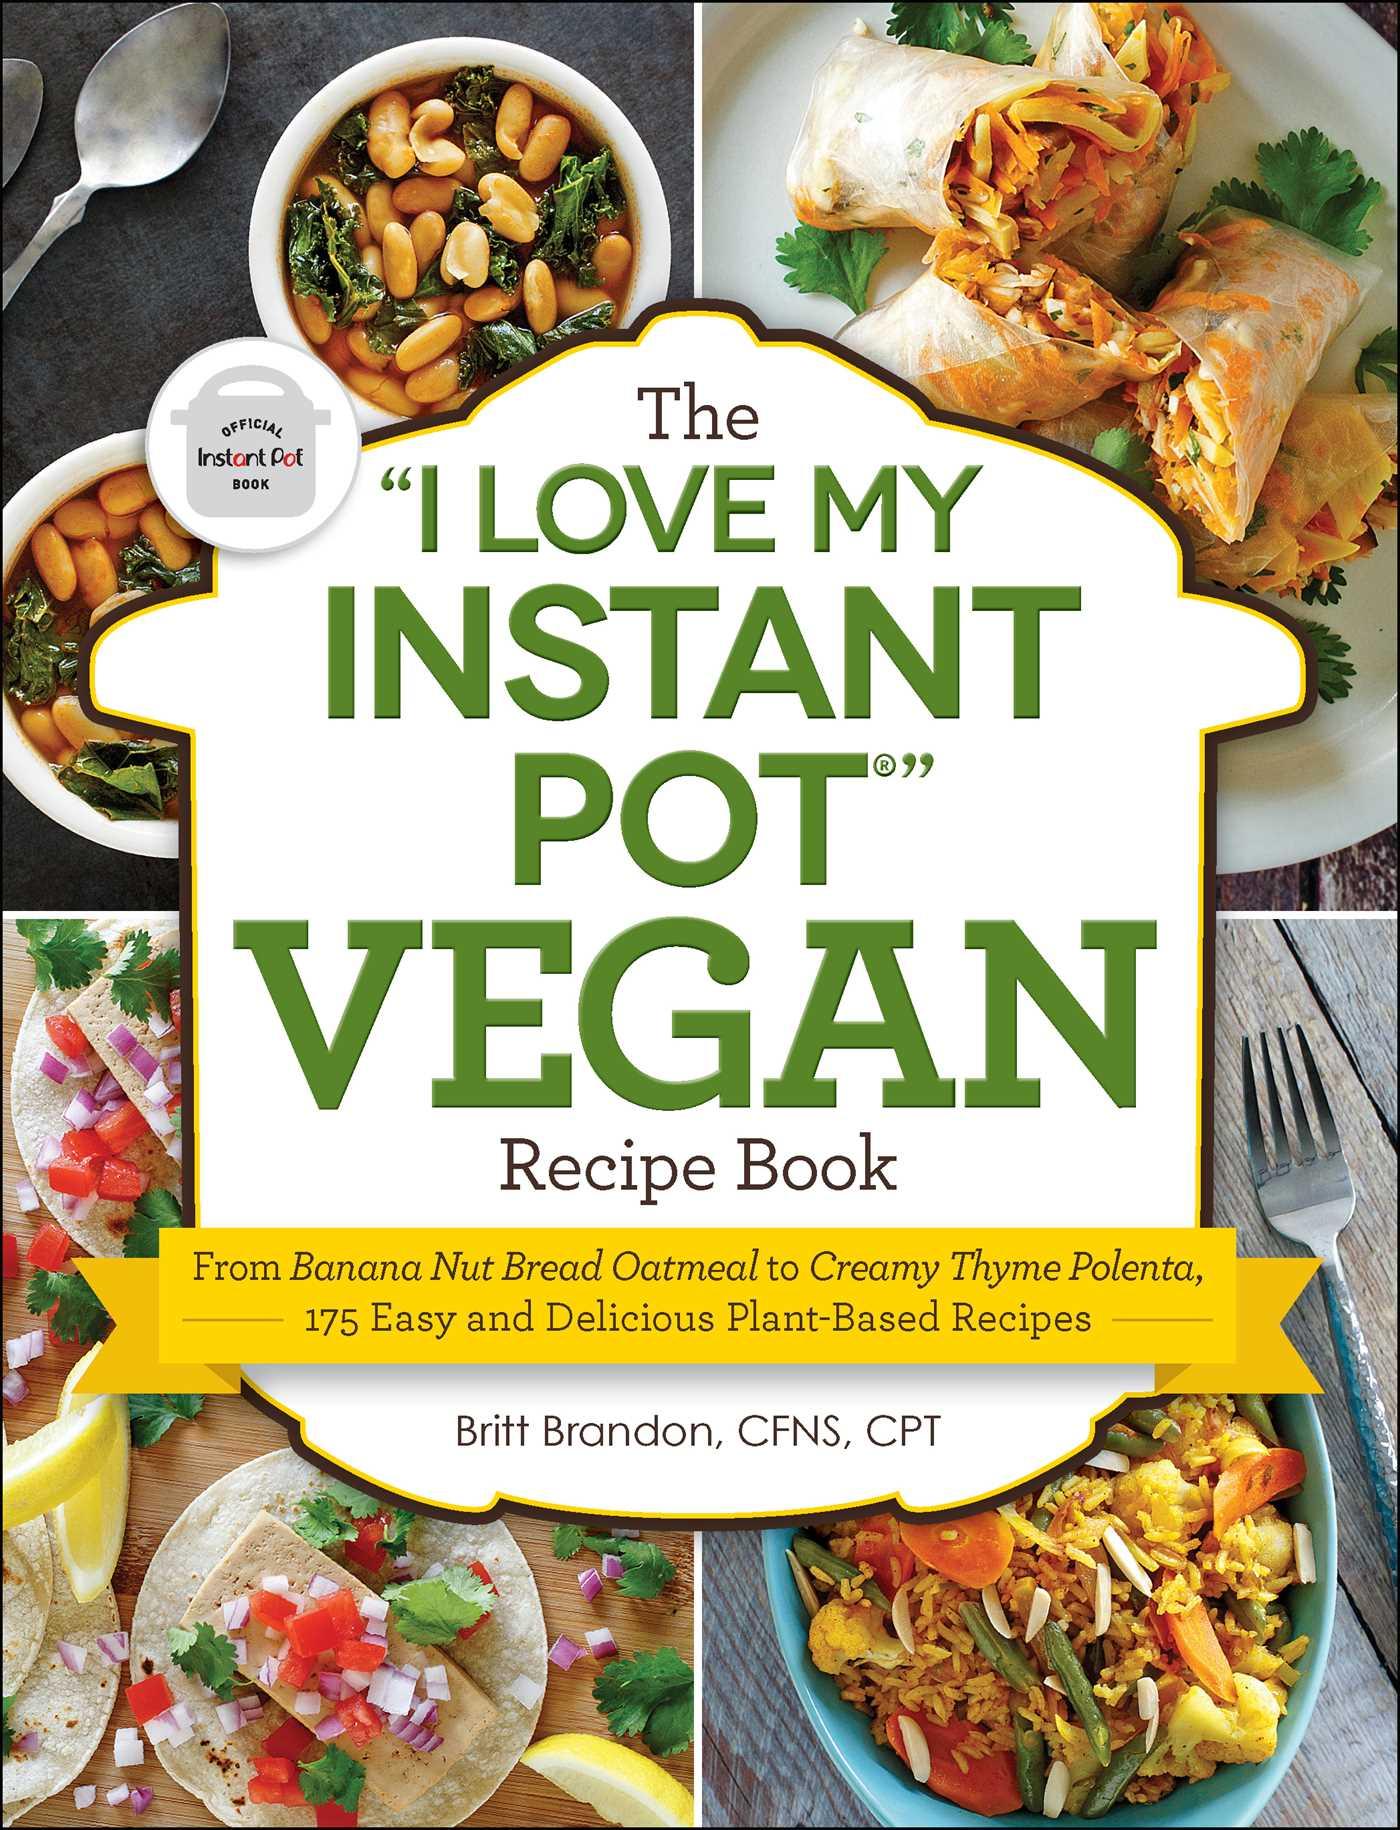 The i love my instant pot vegan recipe book 9781507205761 hr